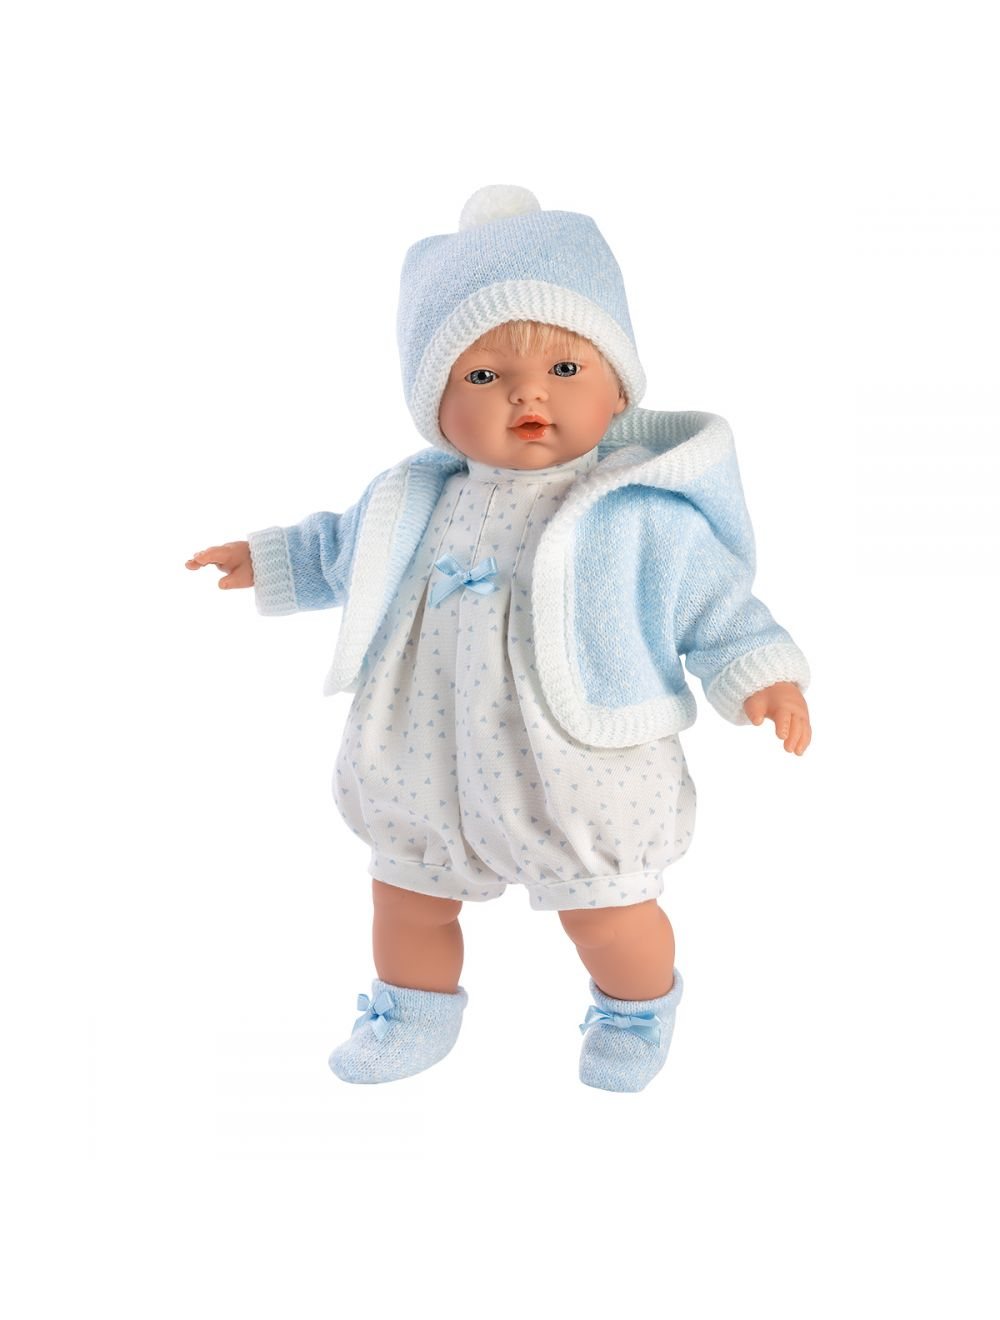 Llorens 33295 Lalka płacząca Roberto 33 cm niebieski chłopiec